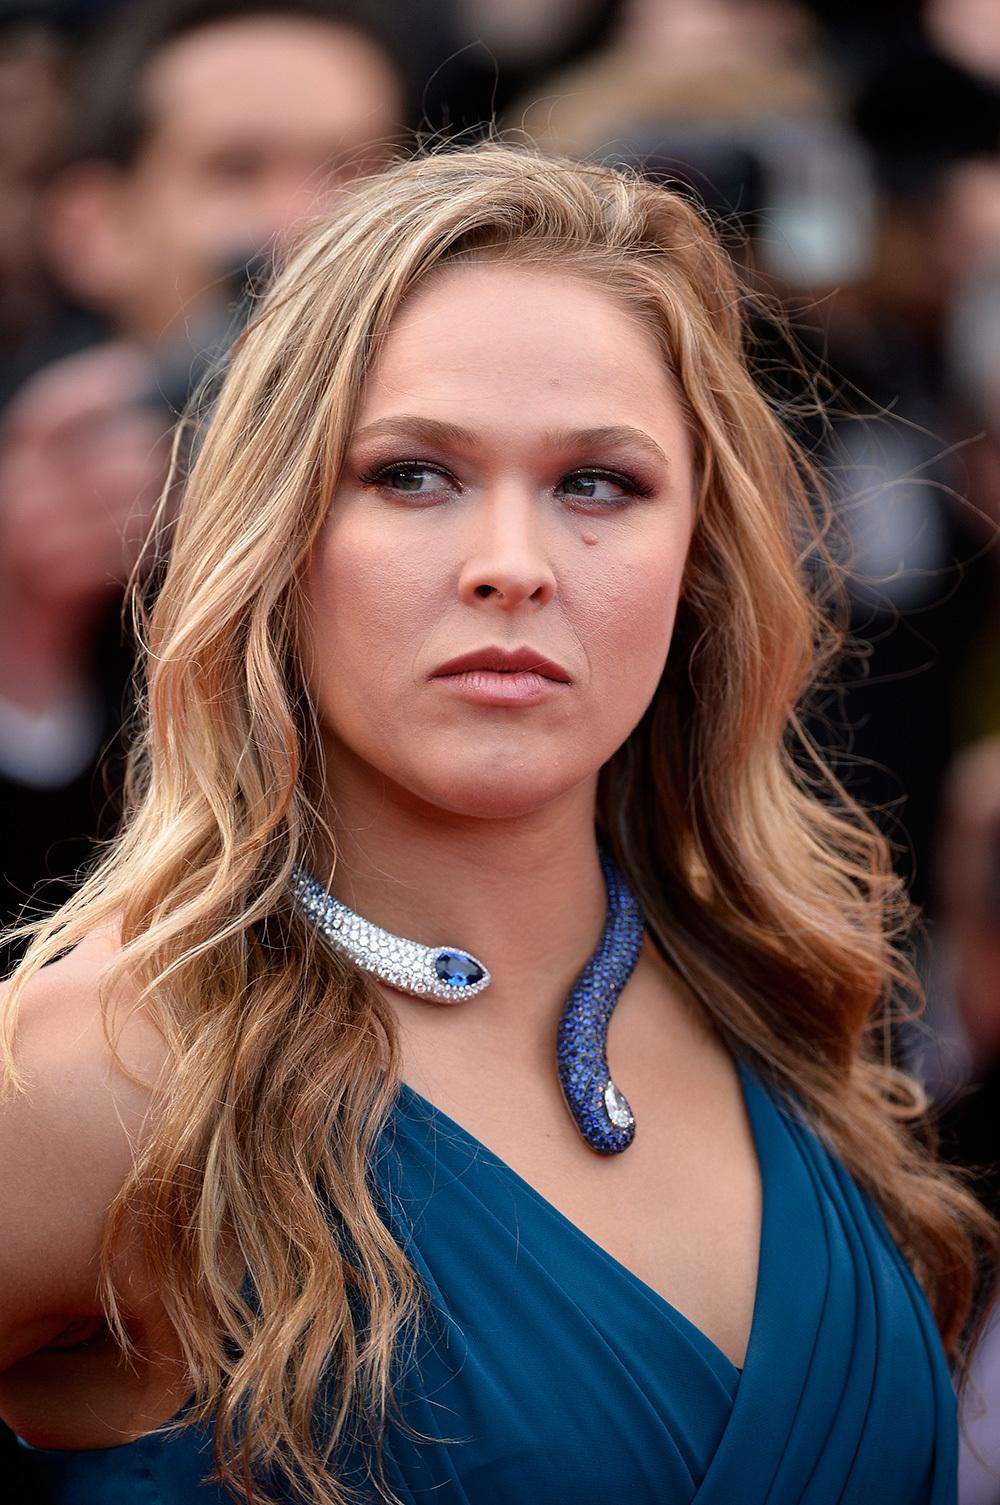 Ronda Rousey Iphone Background